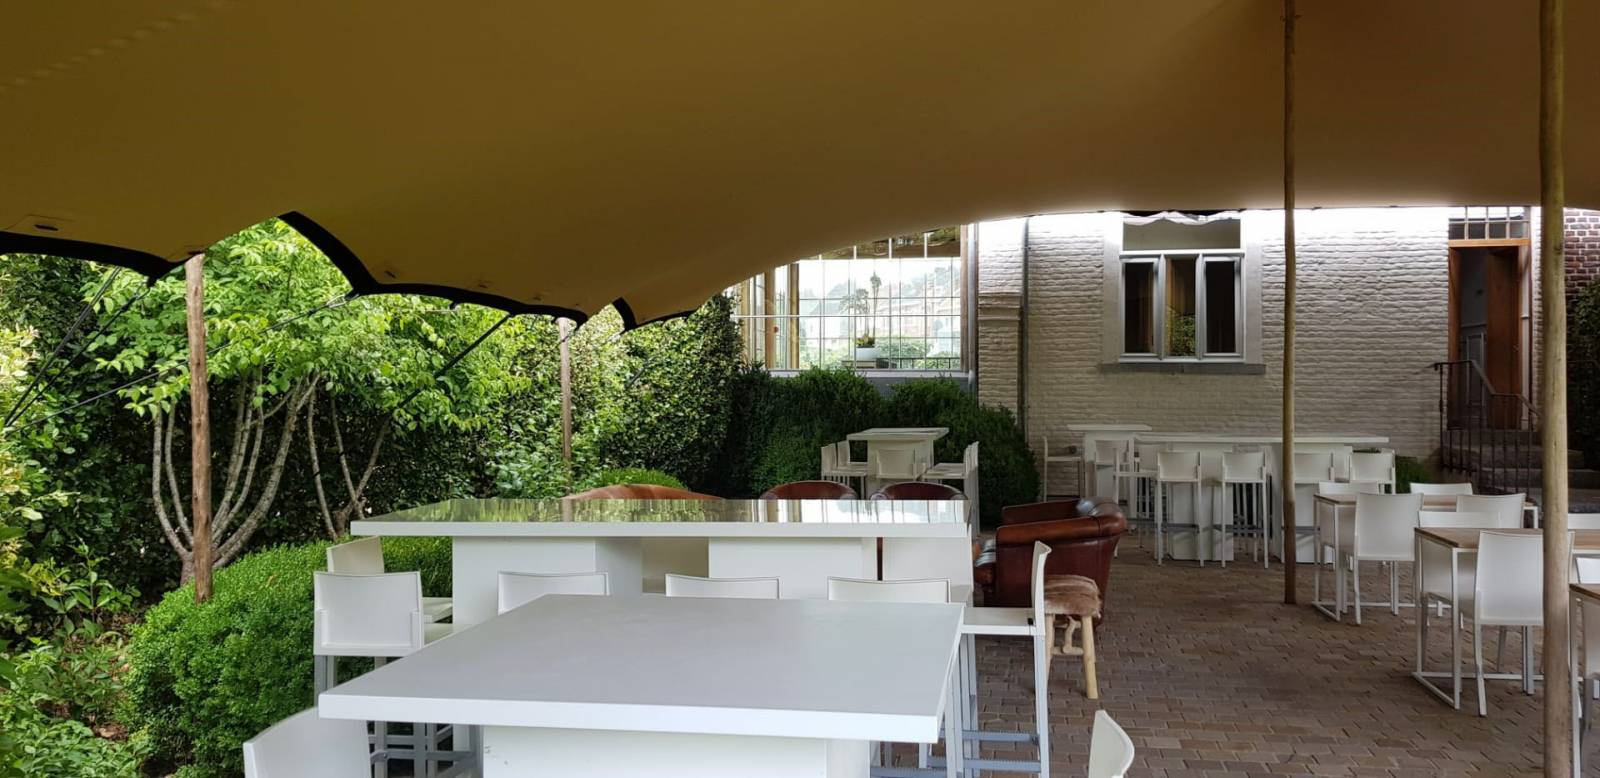 Senth Concept - 26 - Silke Gernaey - House of Weddings